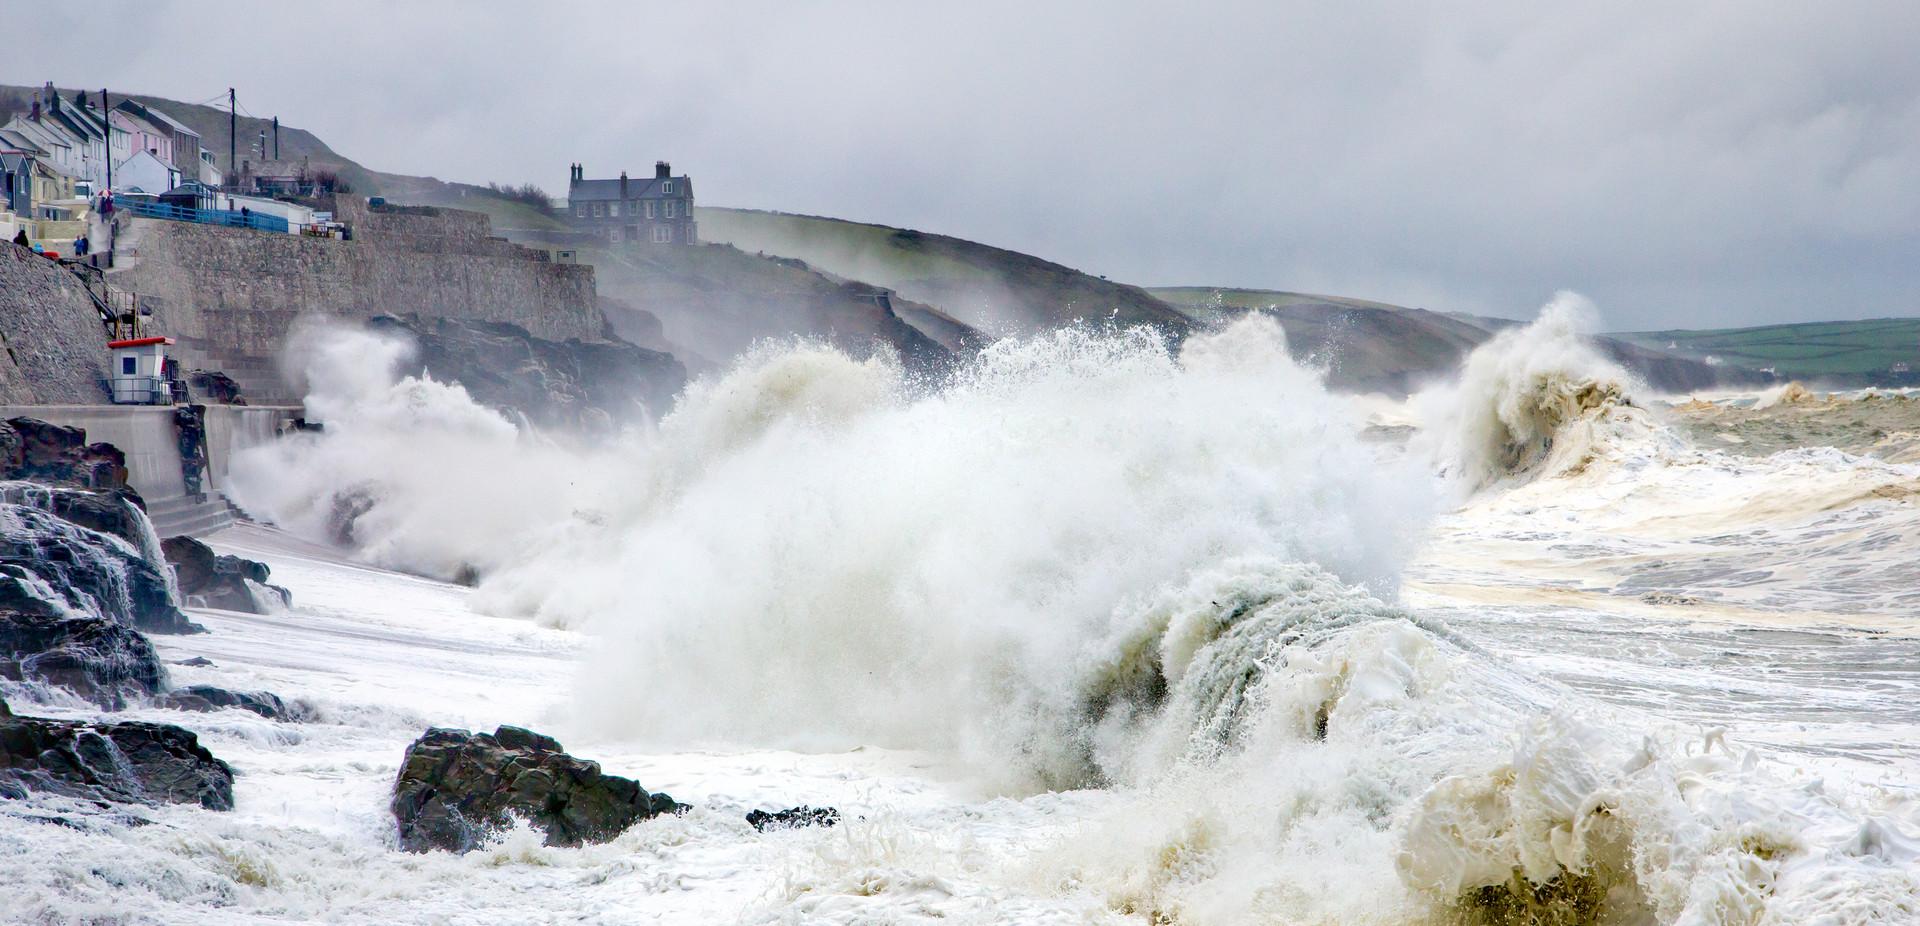 Stormy Seas, Porthleven